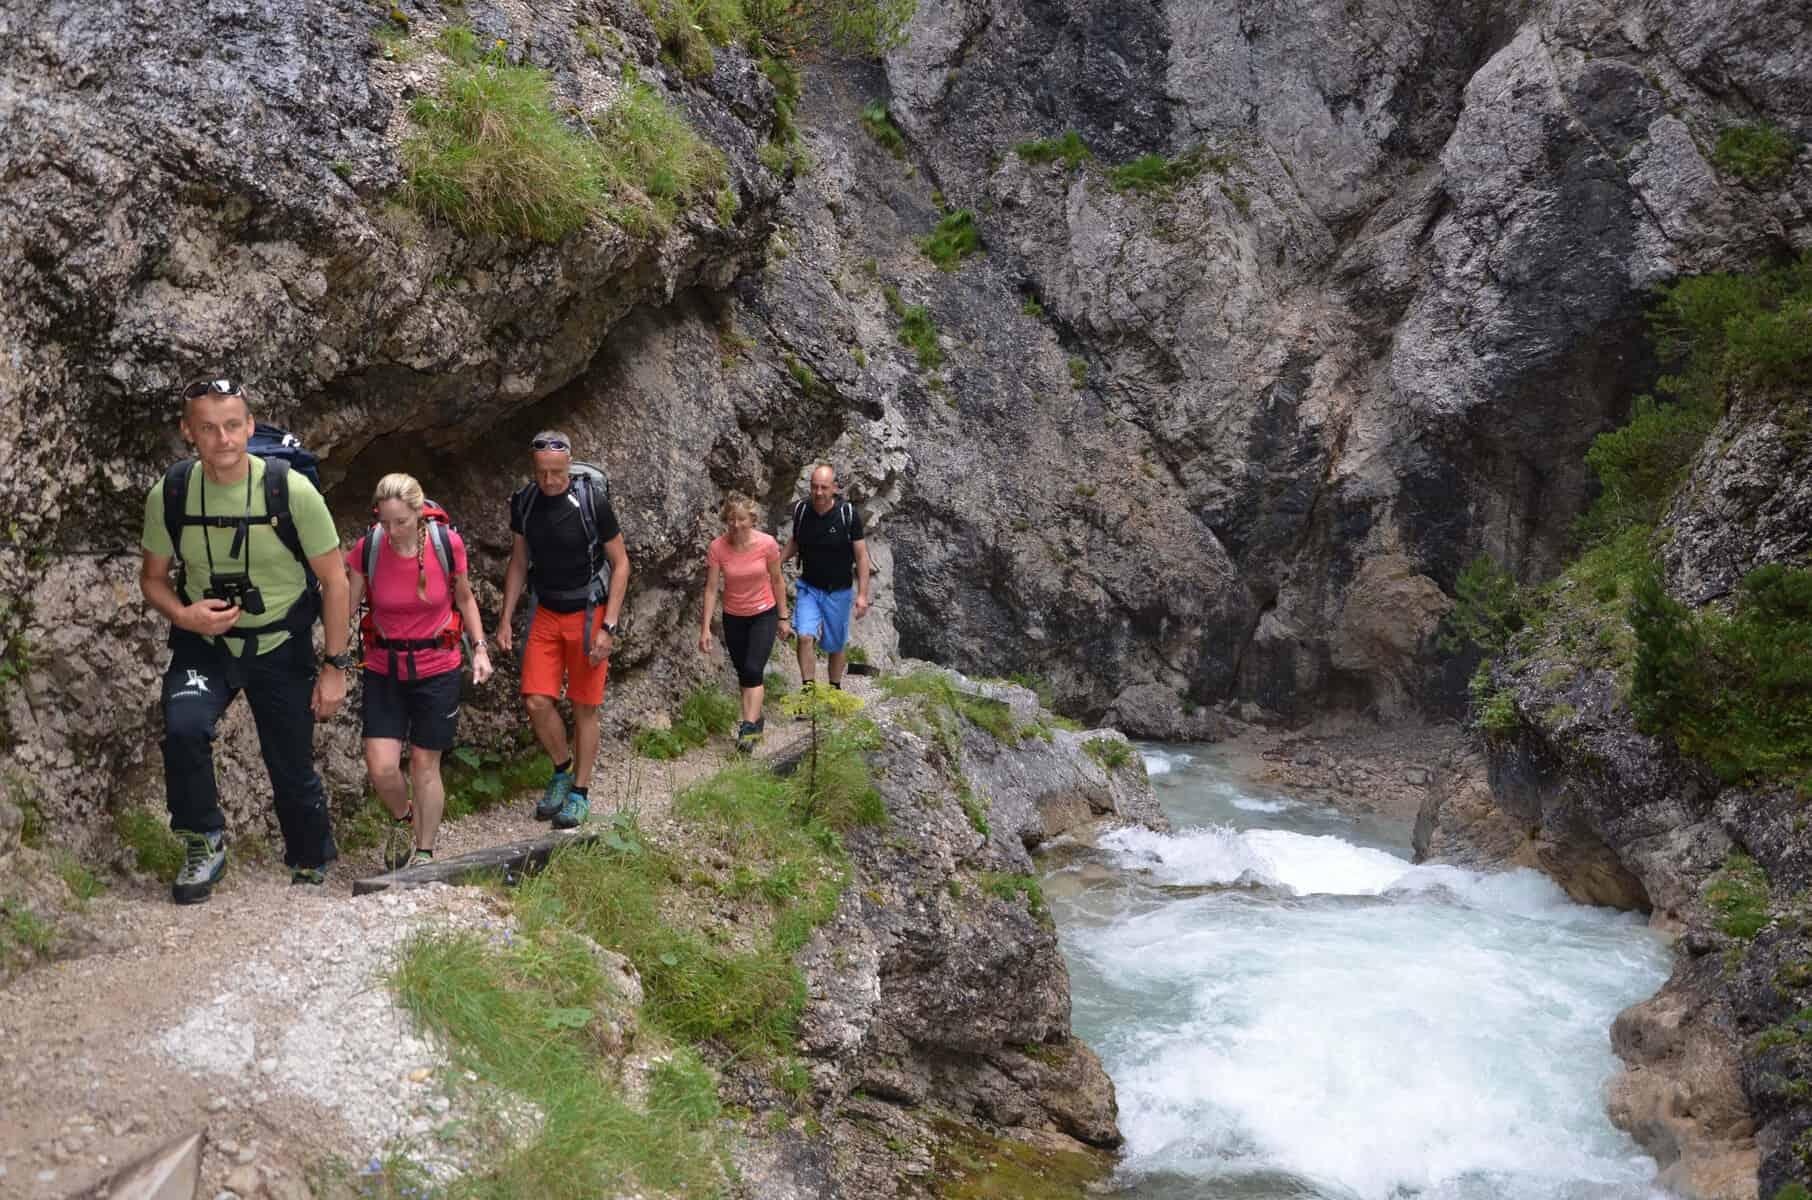 Exkursion: Gleirschklamm - Holz & Trift 257